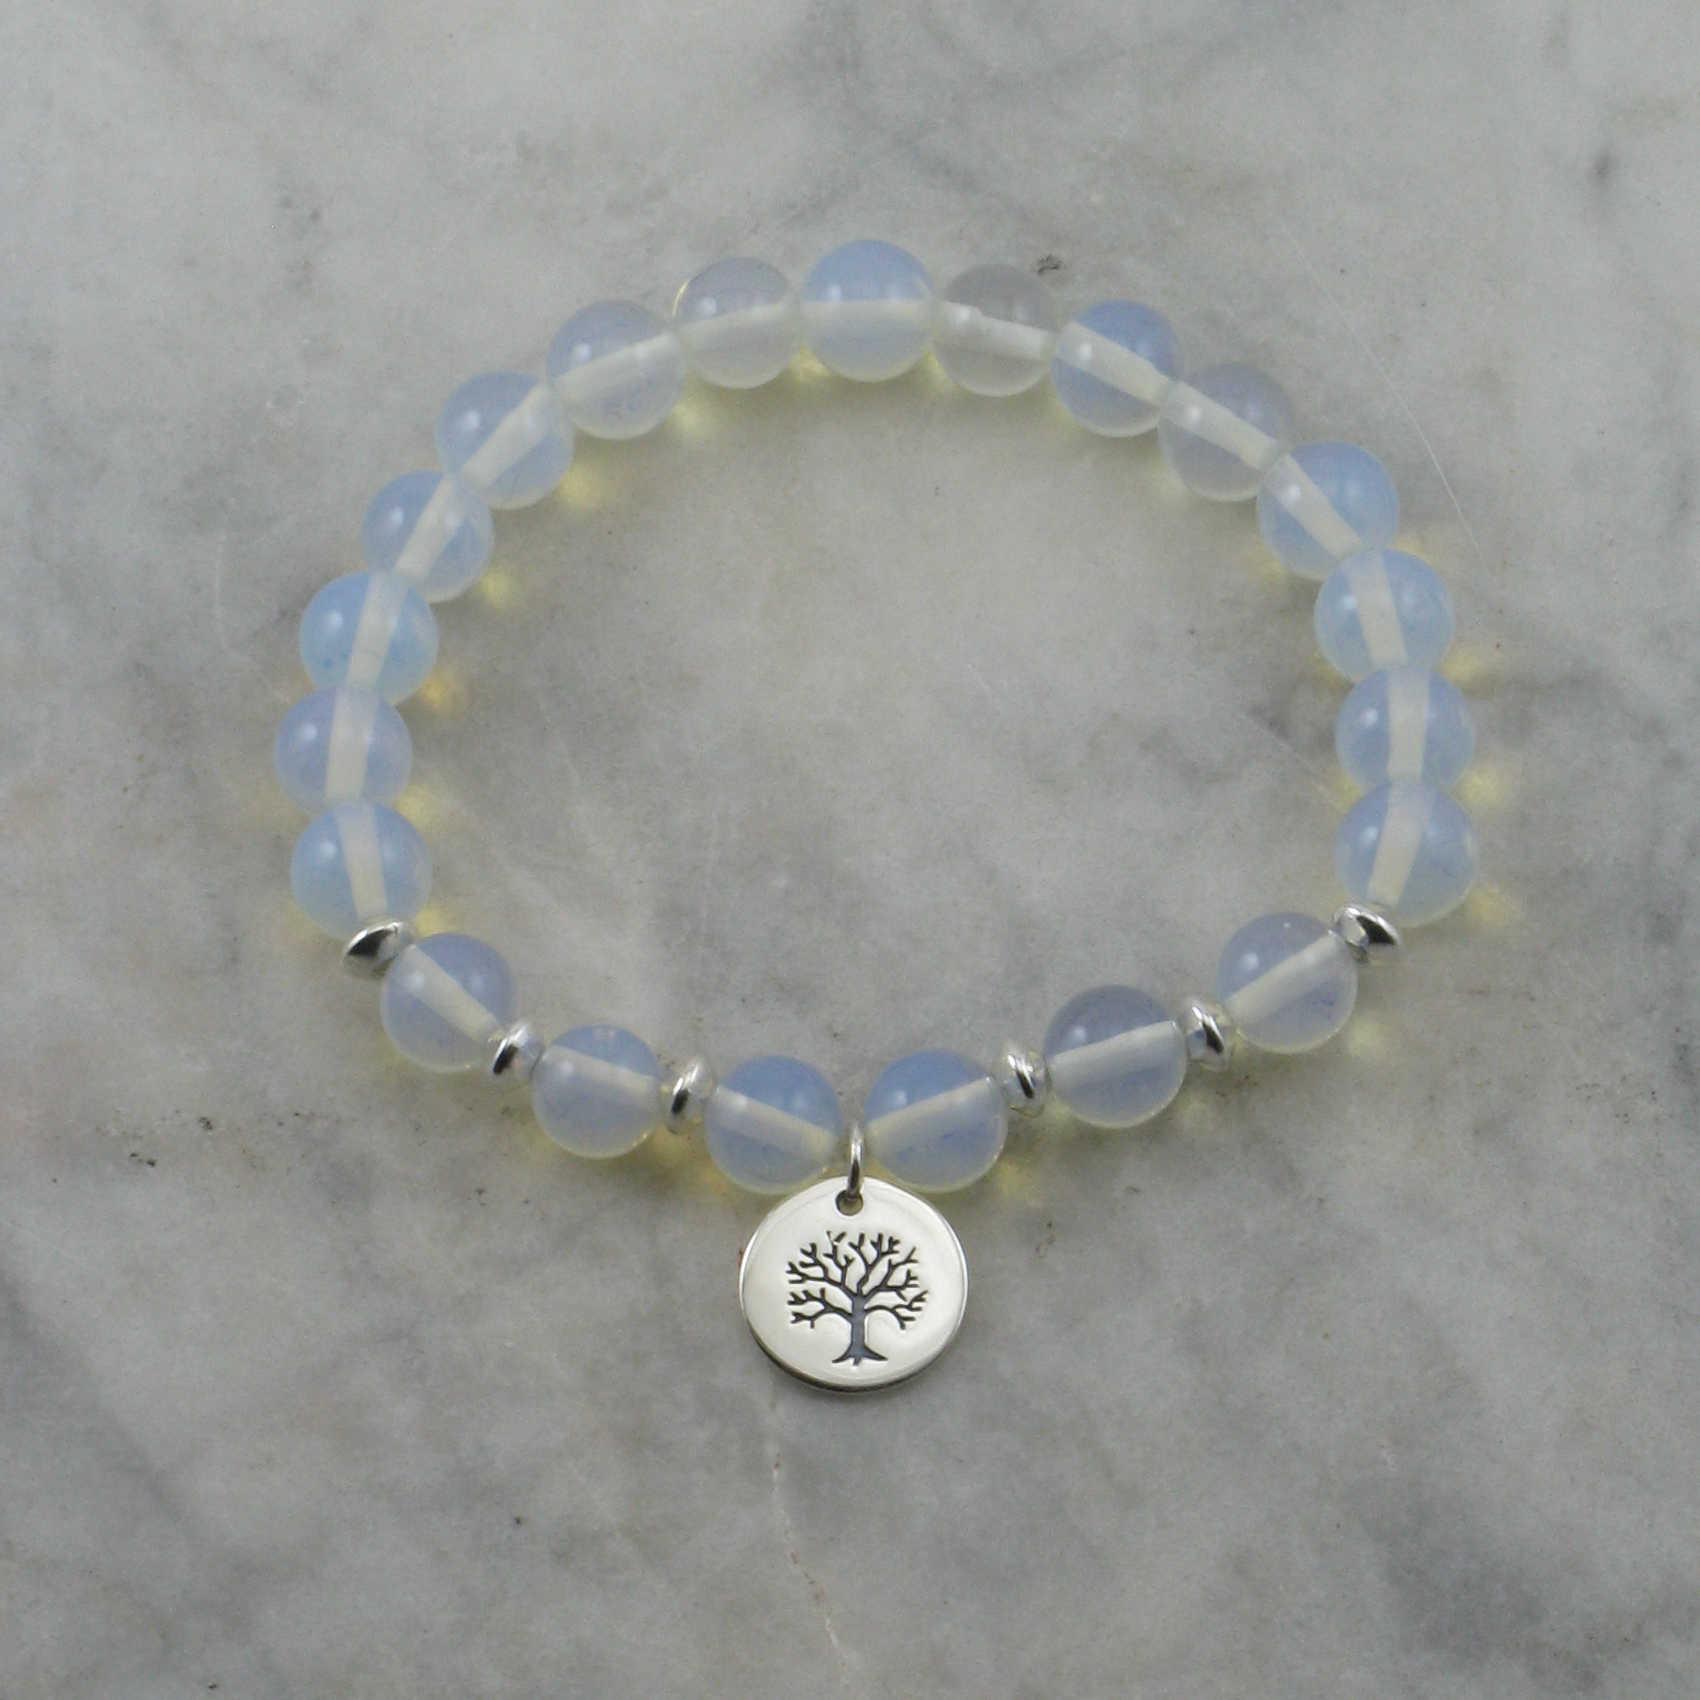 goddess mala bracelet 21 moonstone mala tree of